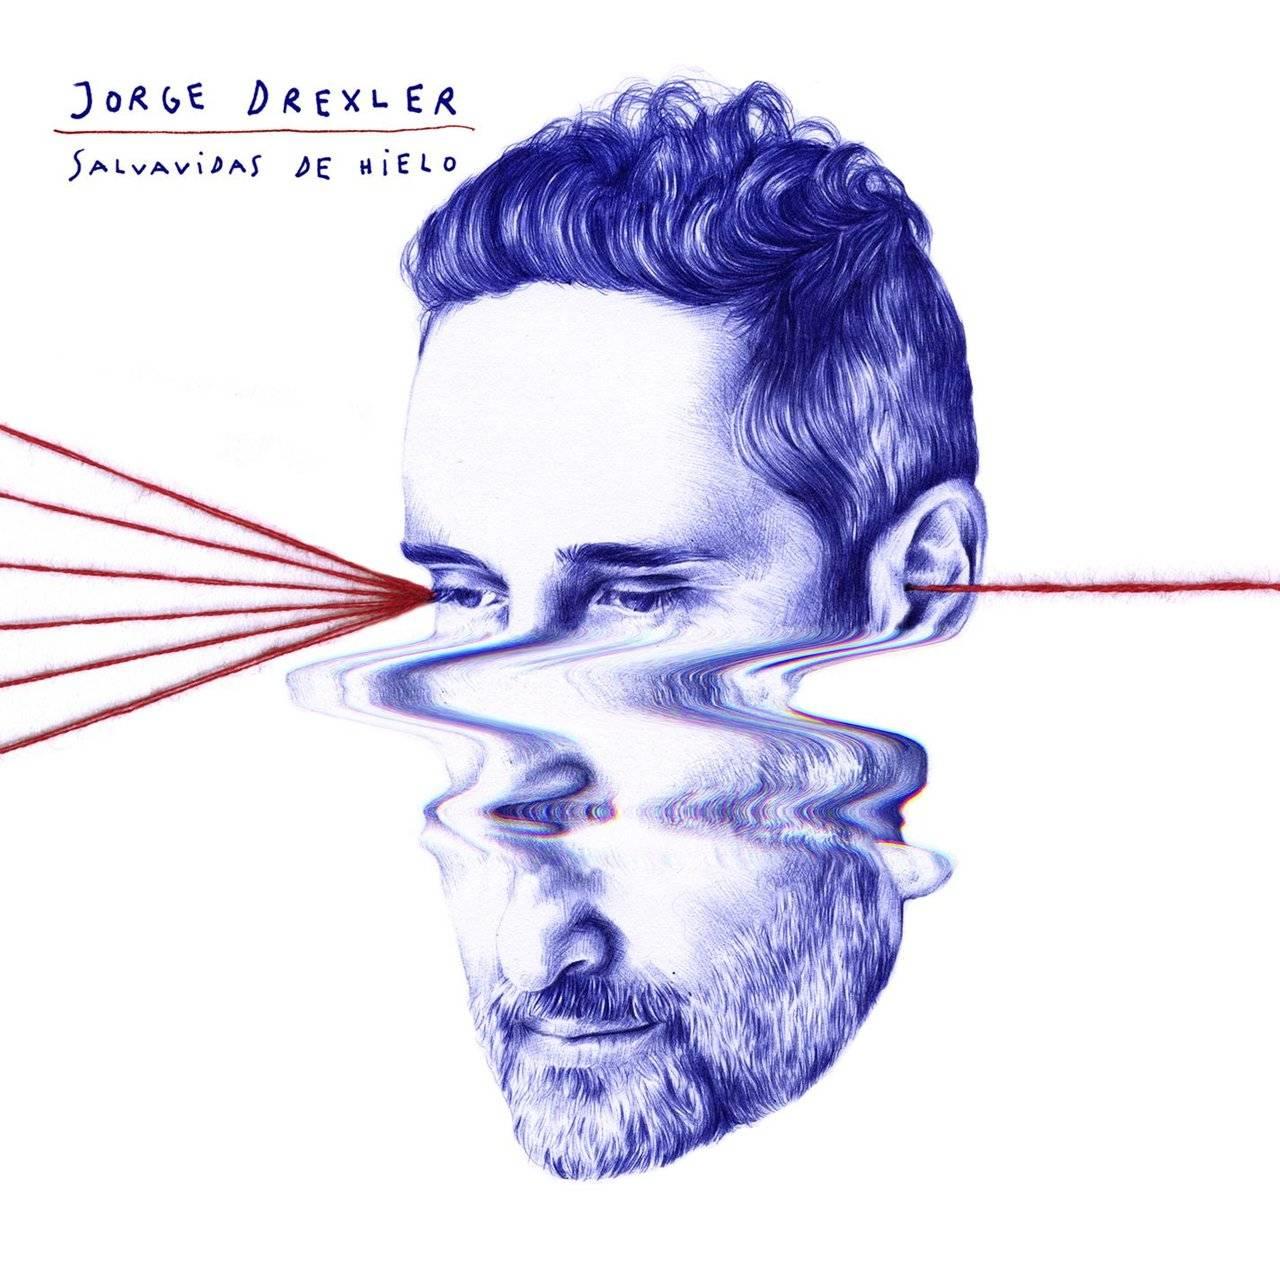 Jorge Drexler - Salvavidas de hielo (2017)